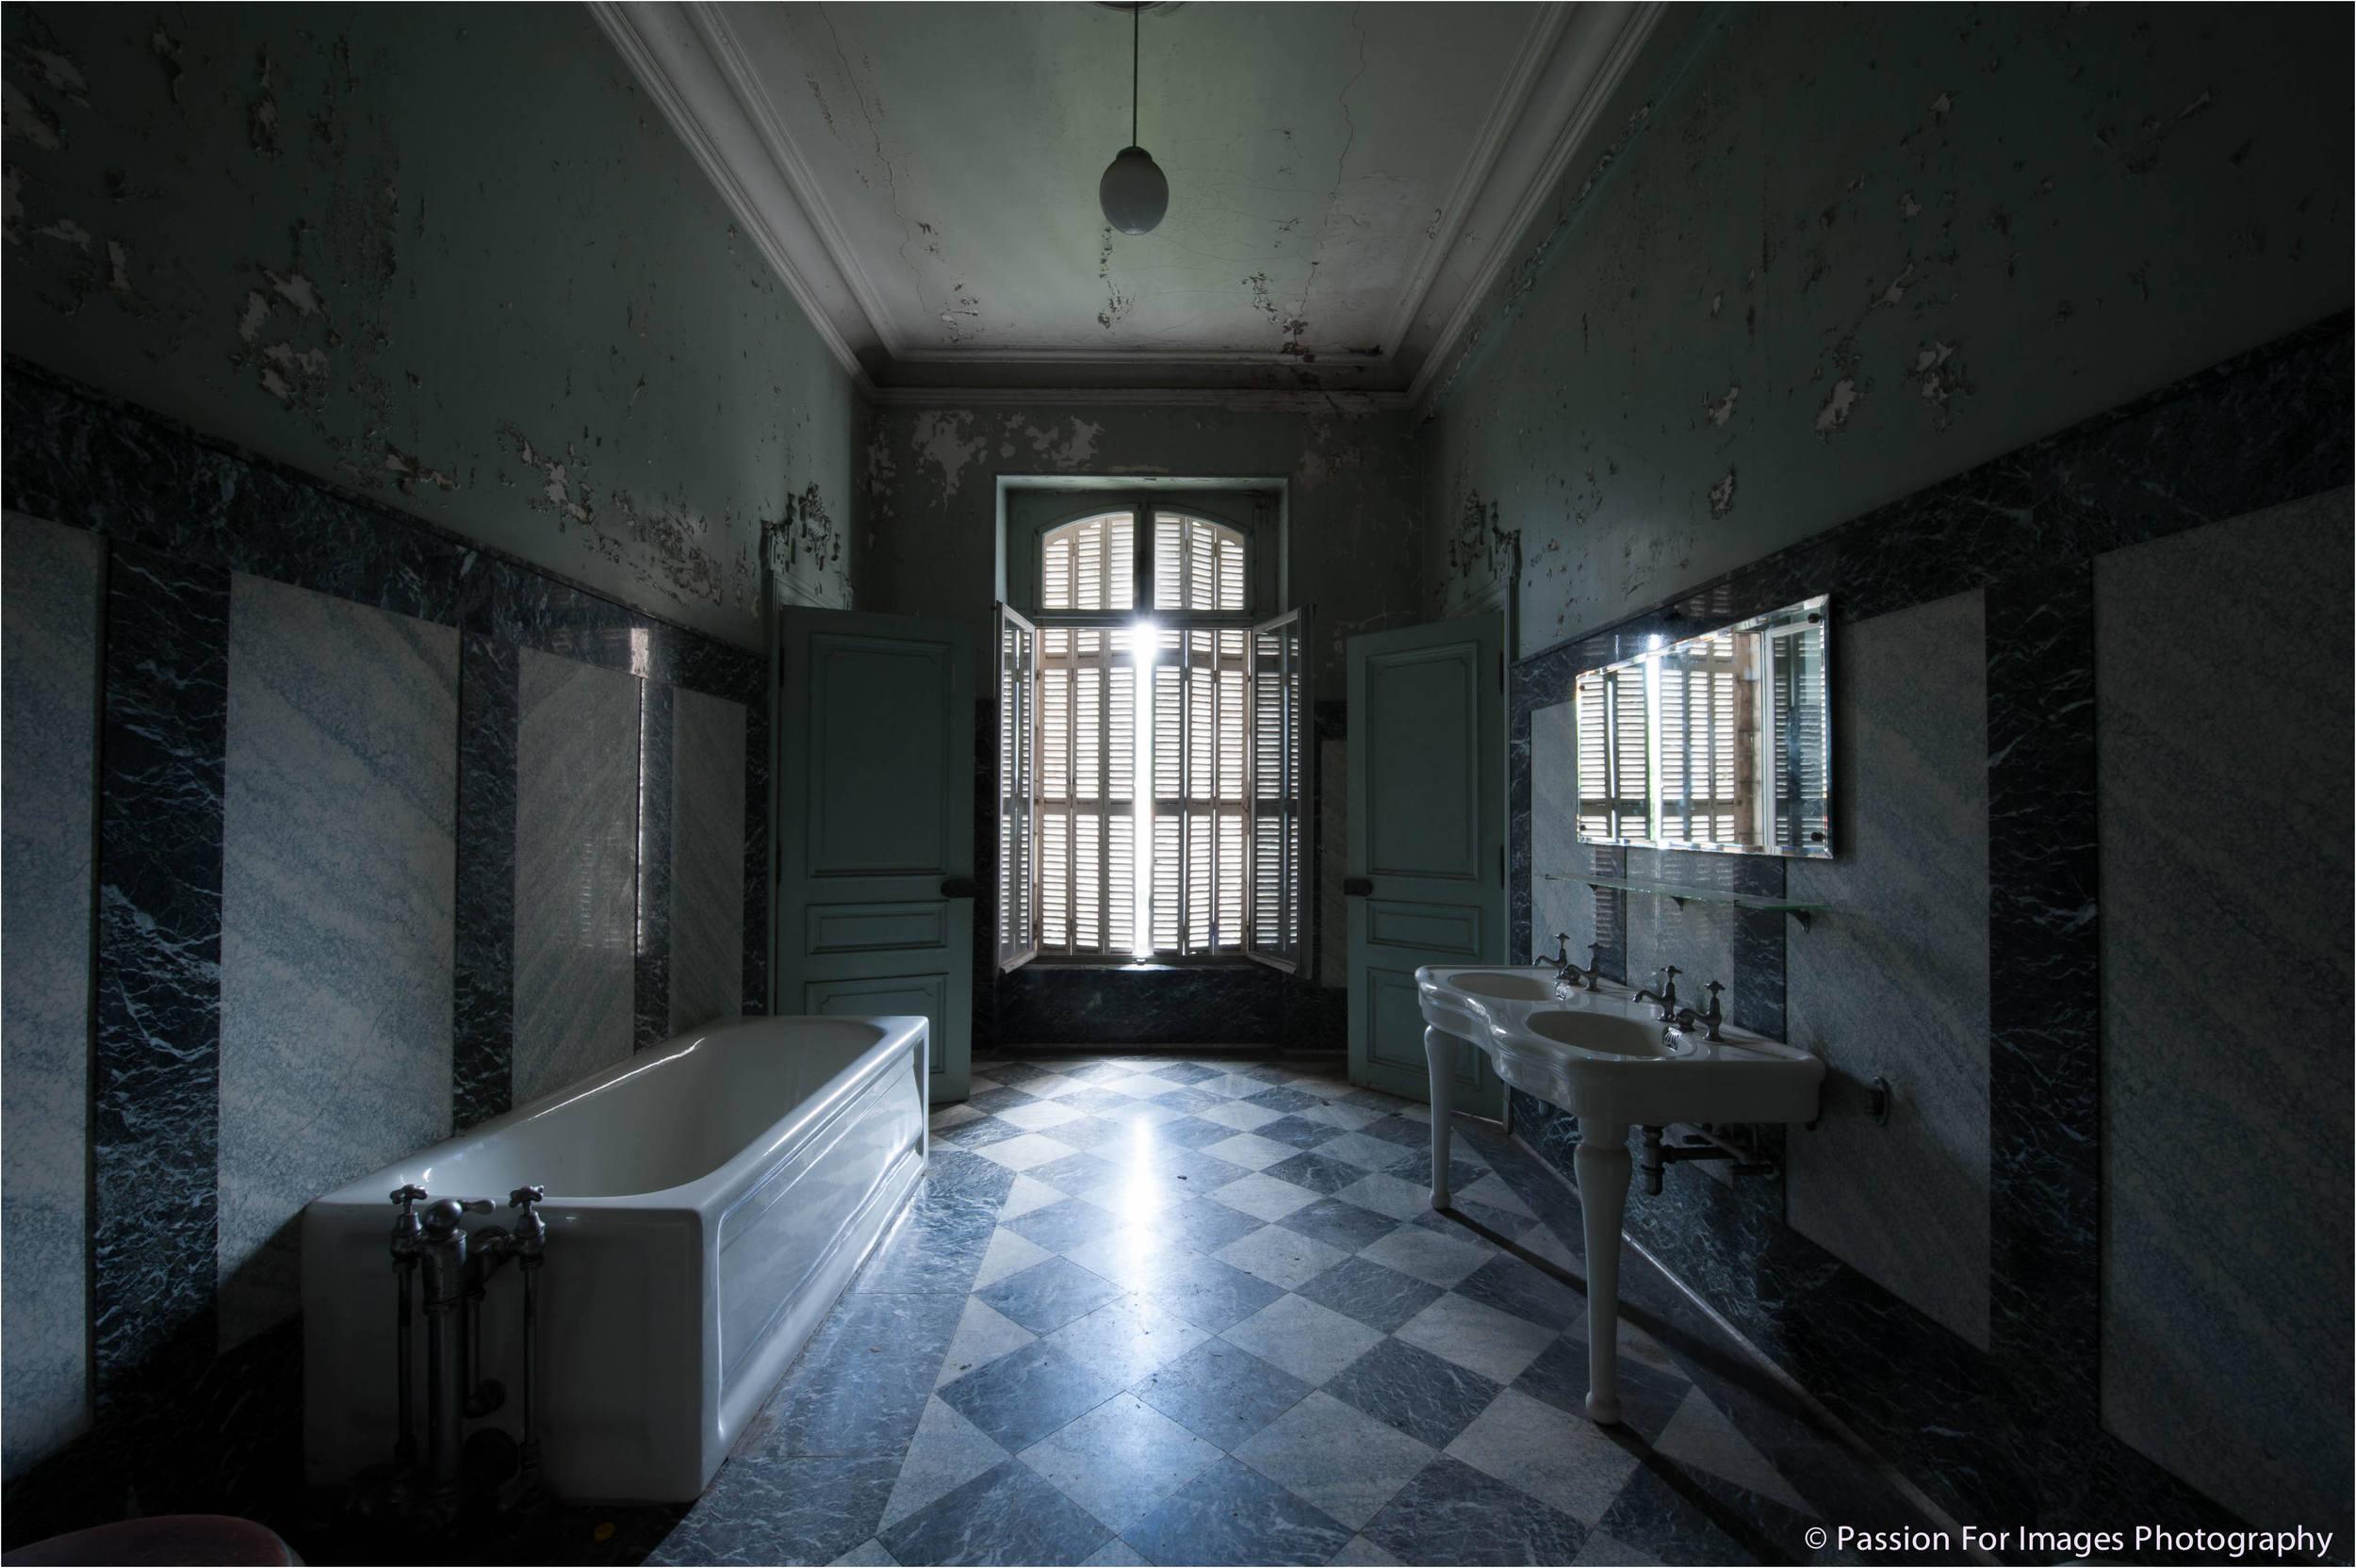 PFI__D7C0584_2014_08_Chateau_Lumiere.jpg